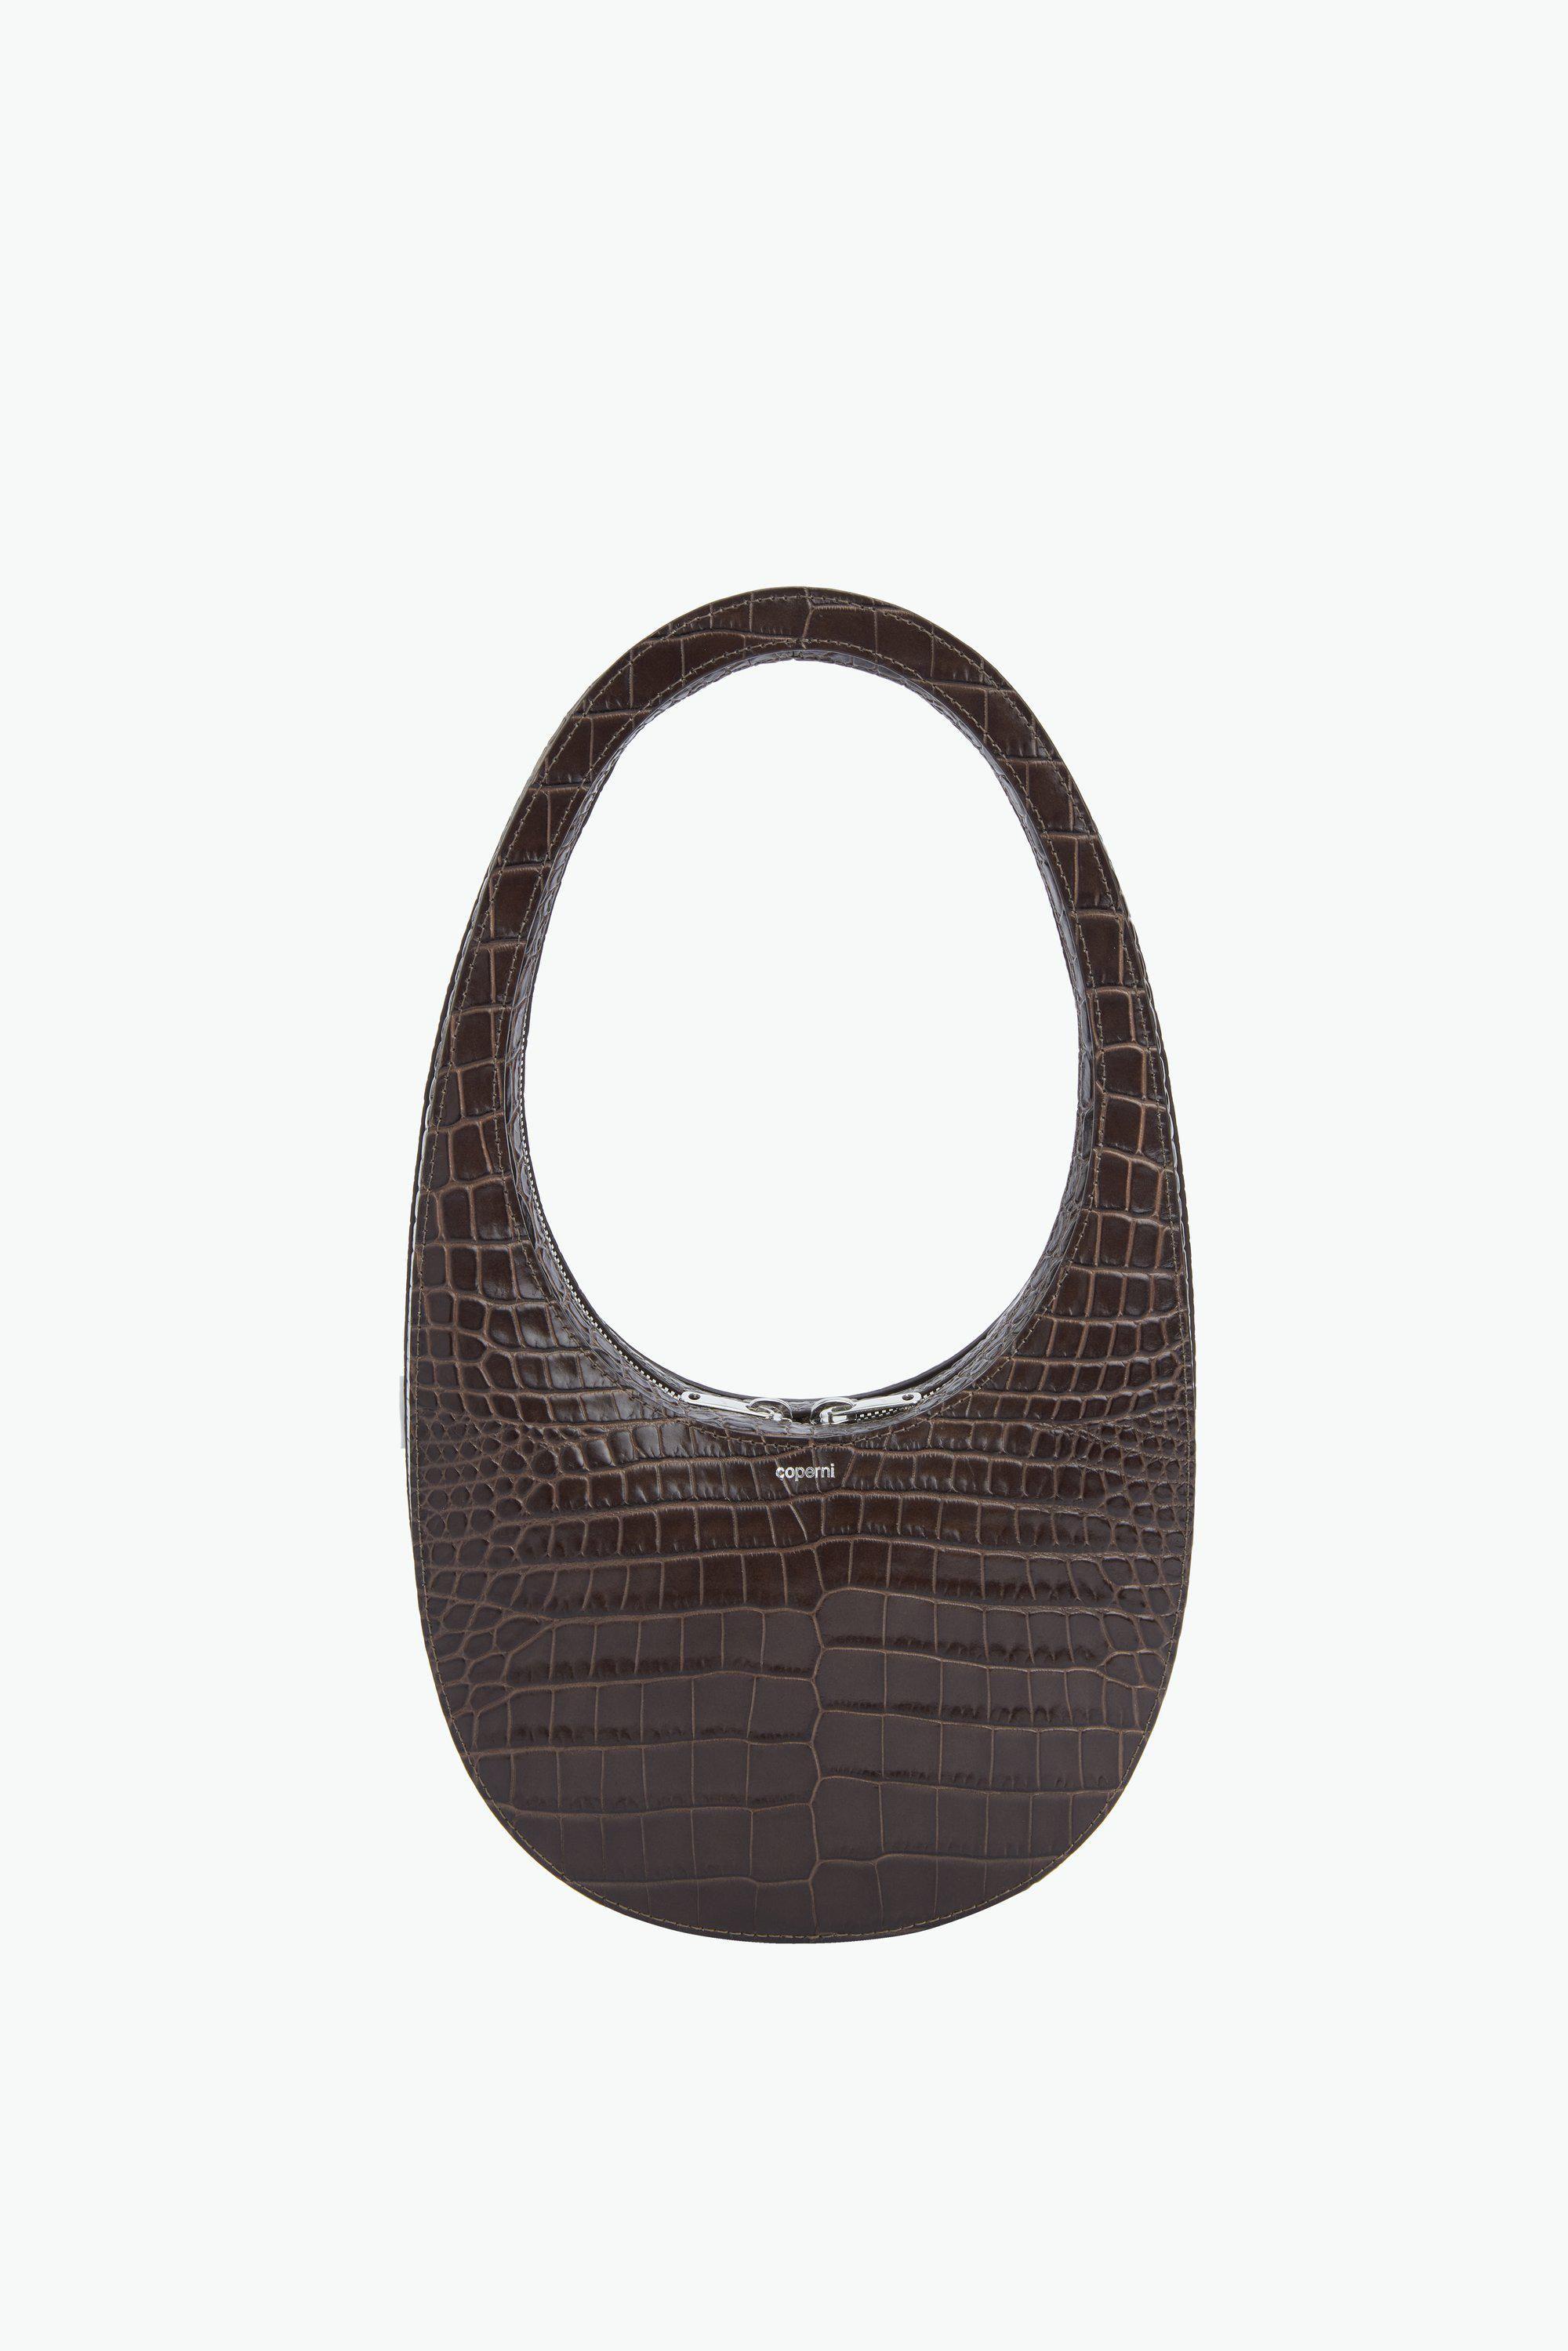 coperniparis croc swipe bag